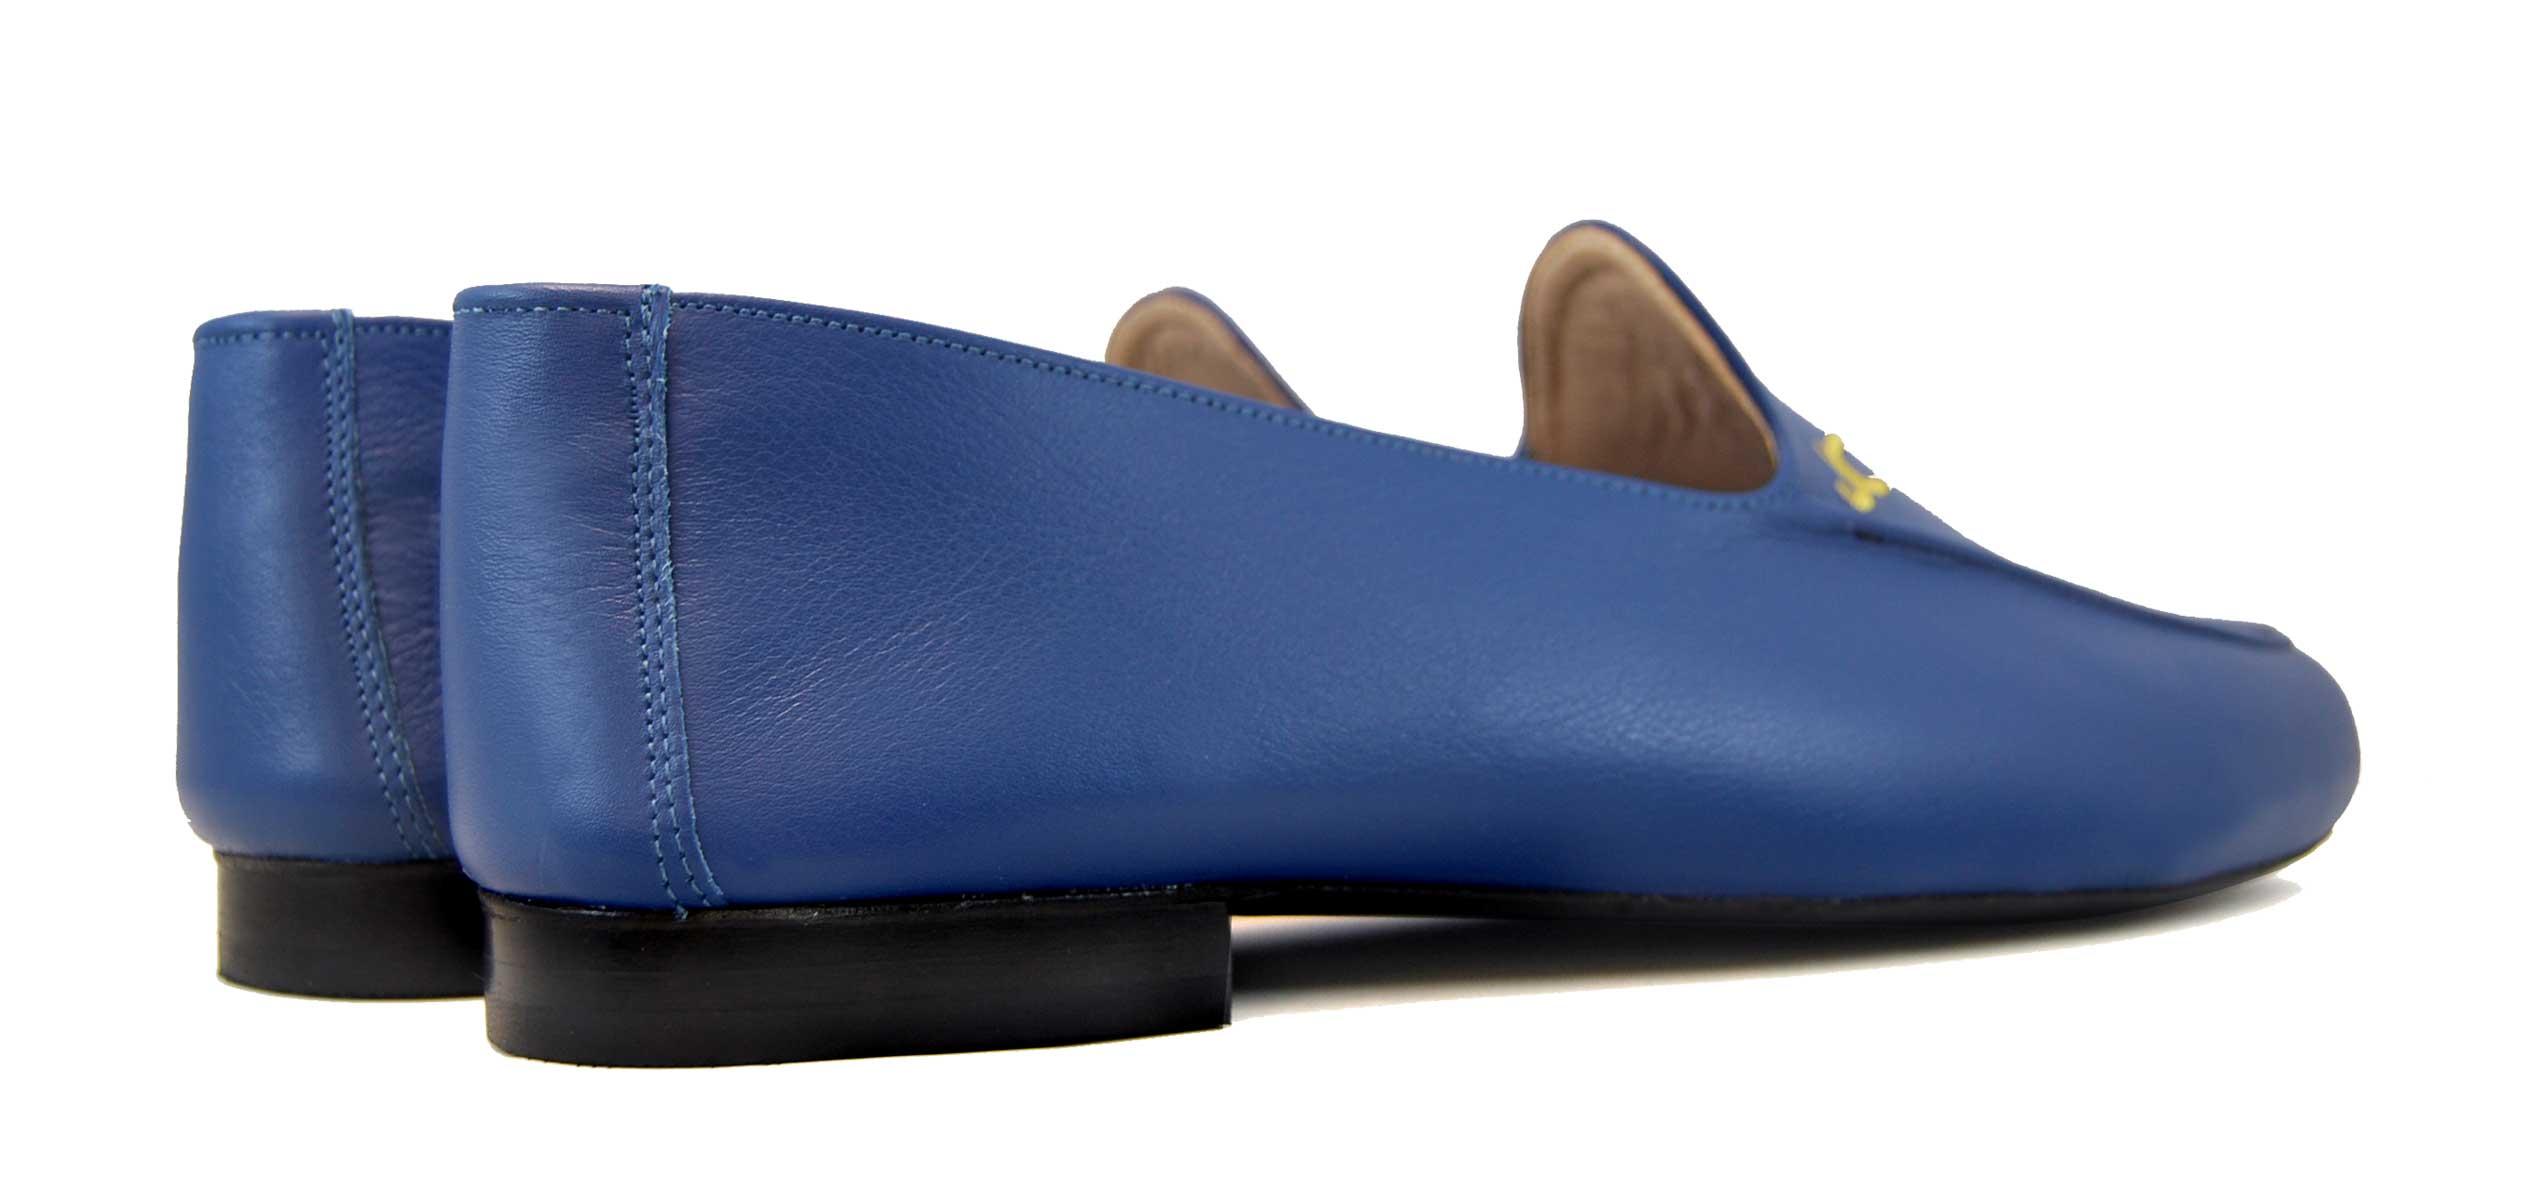 Foto 4 de Zapatos Julio Iglesias 528 JC Azulon Napa